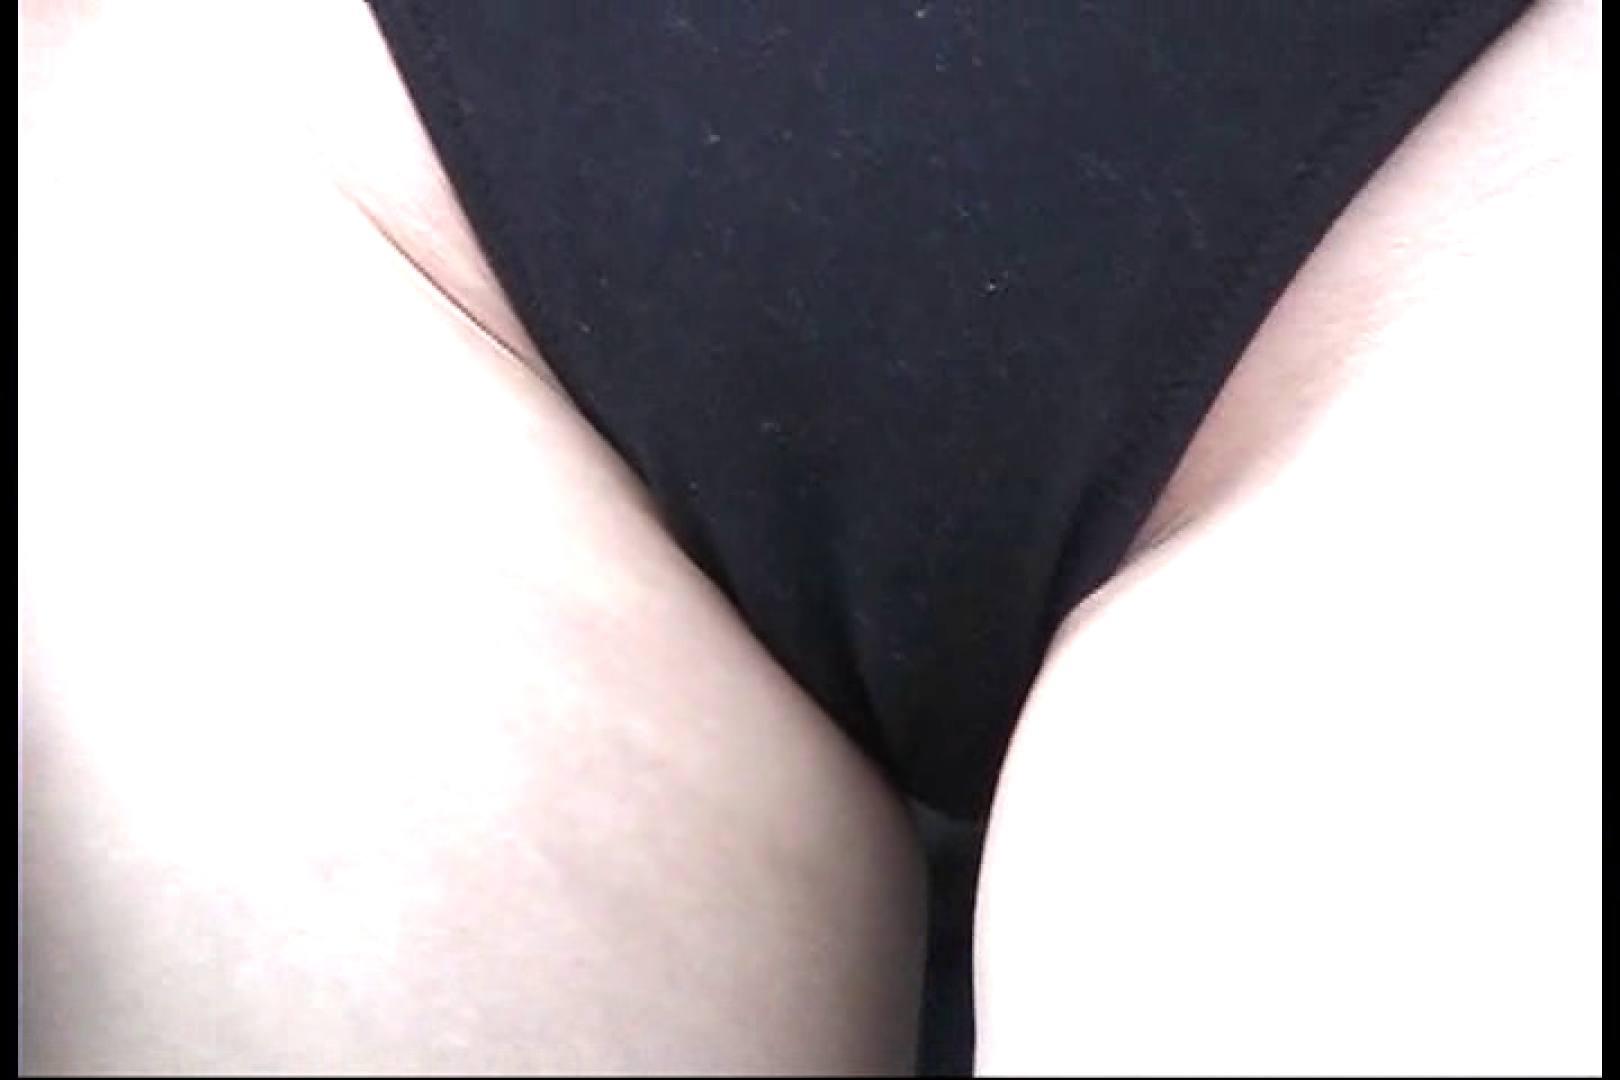 RQカメラ地獄Vol.8 美女OL  84連発 56